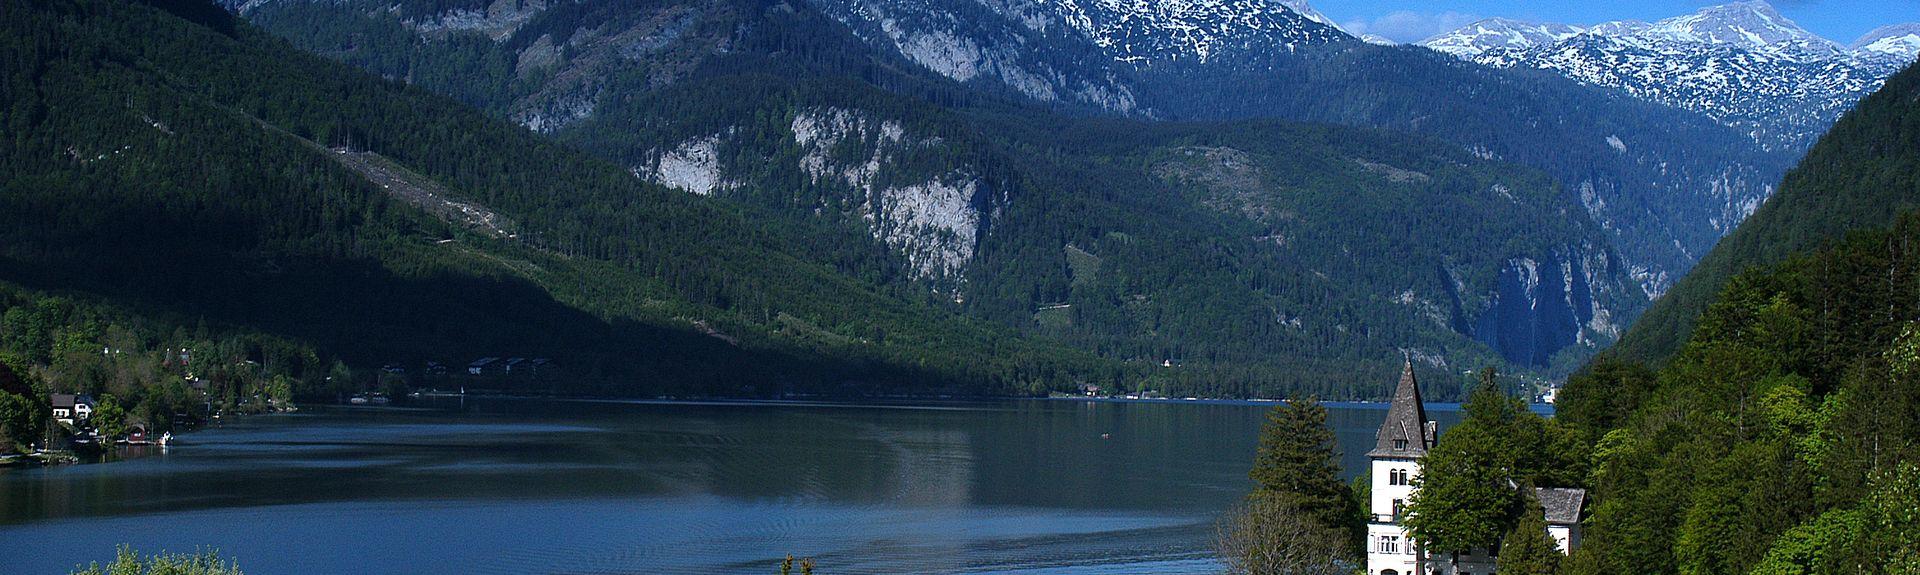 Hinterstoder, Haute-Autriche, Autriche